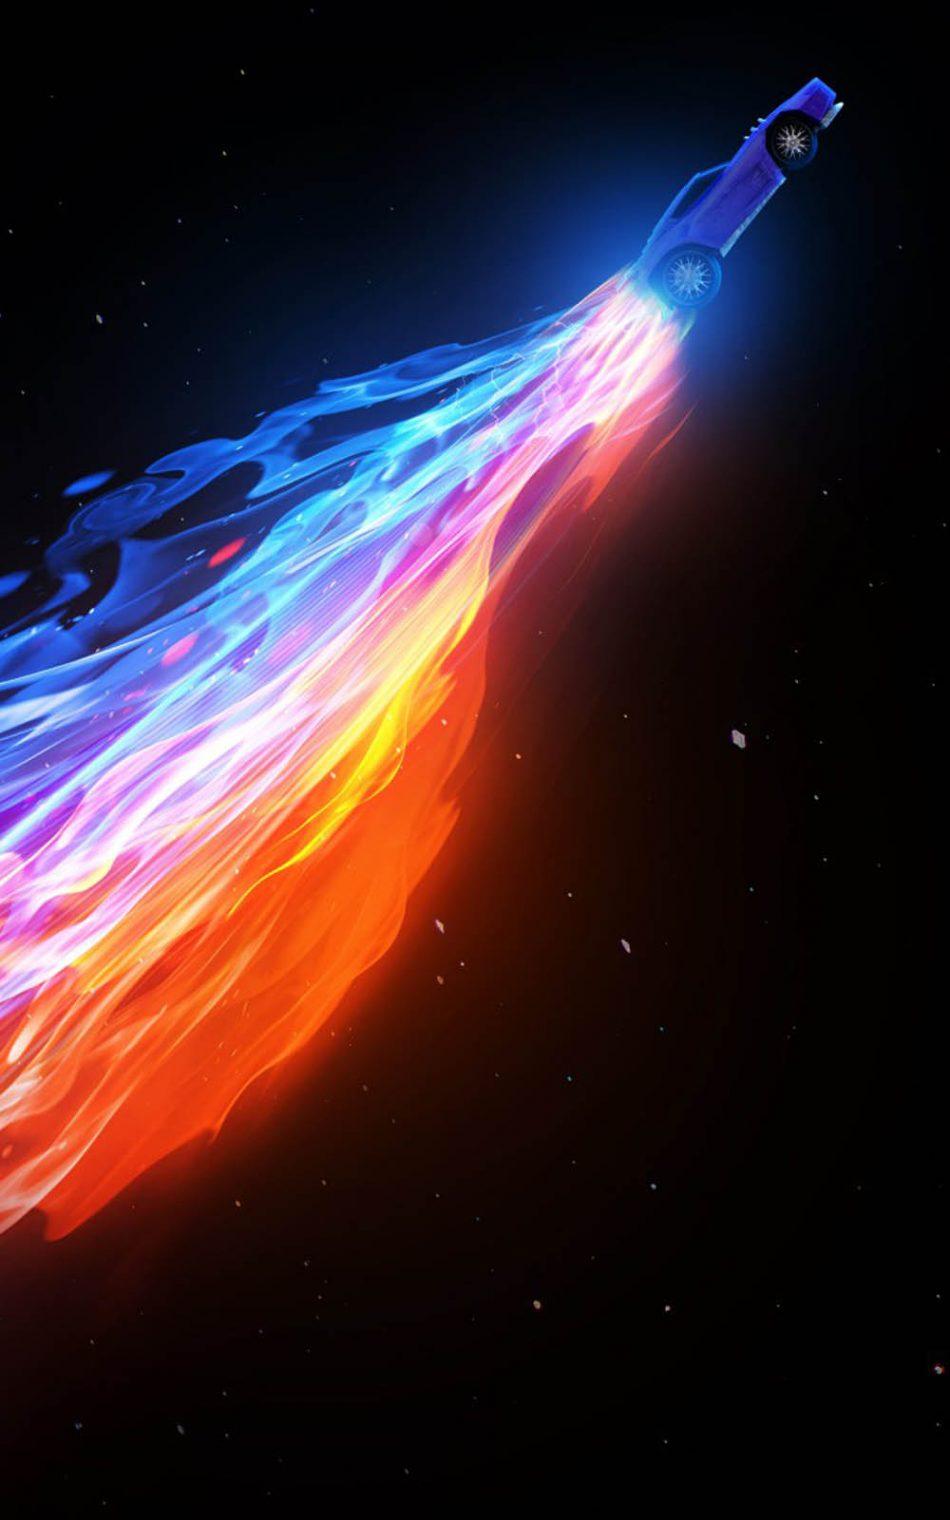 Download Rocket League Free Pure 4K Ultra HD Mobile Wallpaper